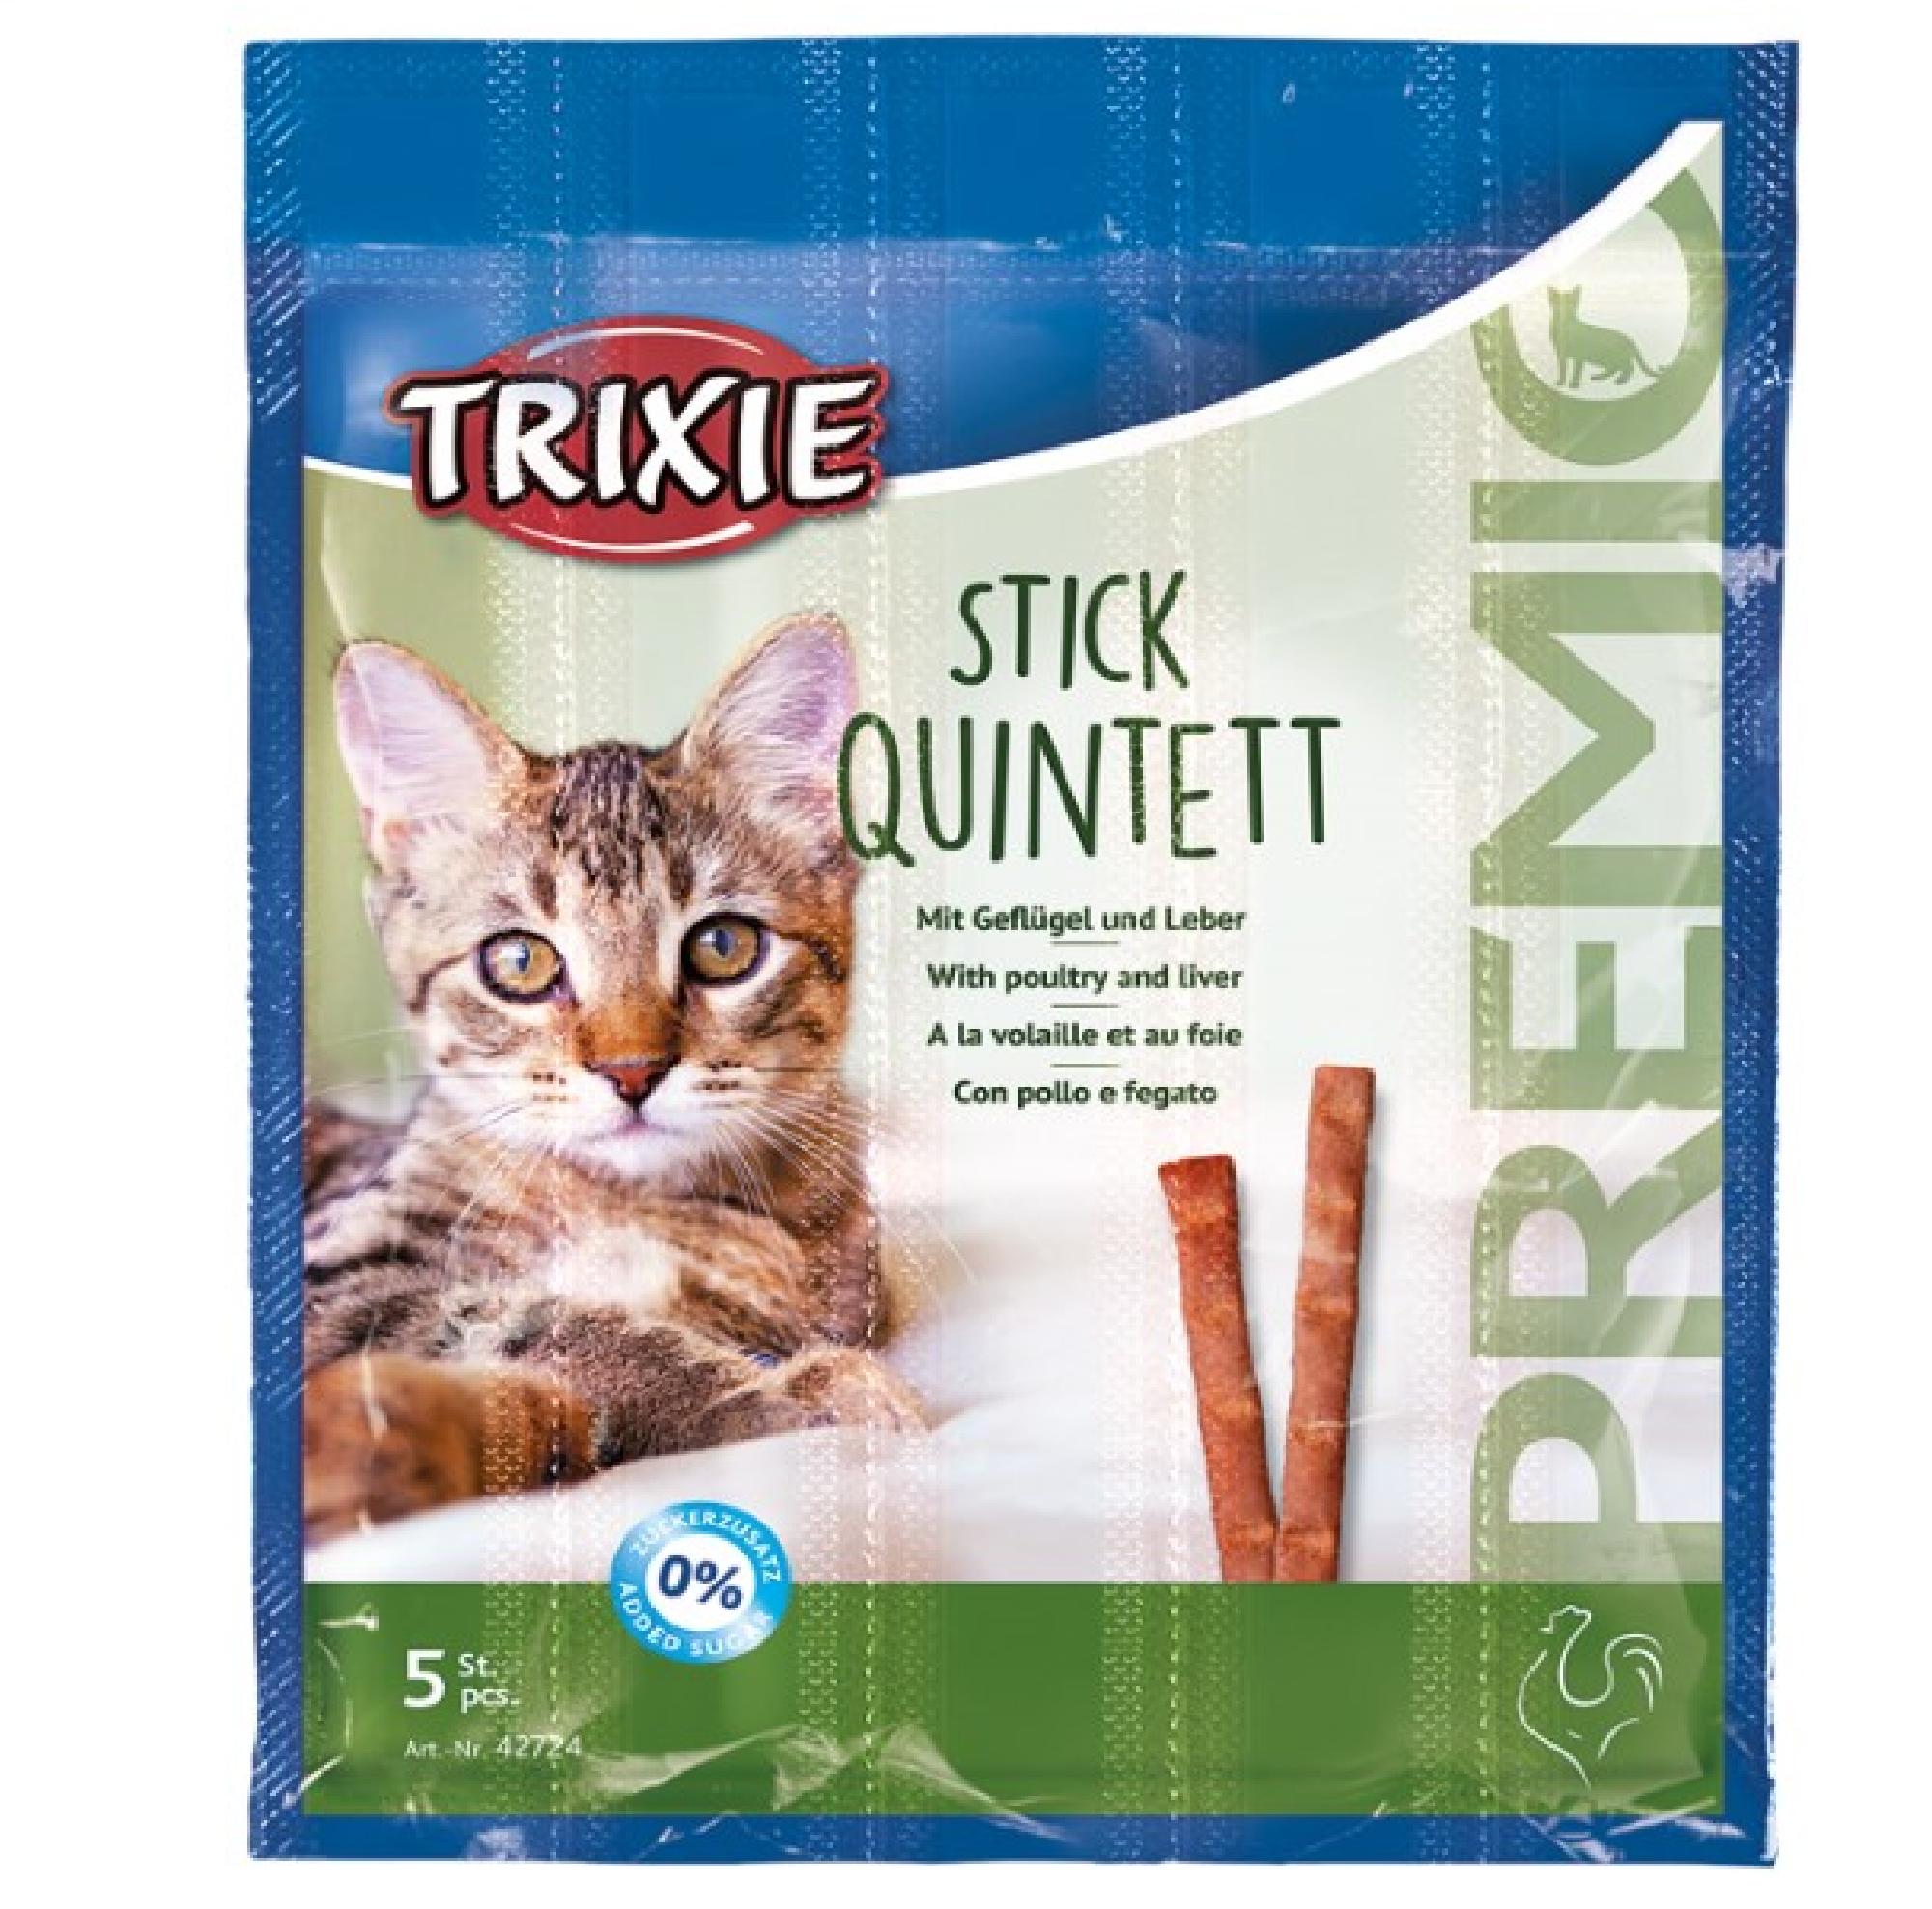 PREMIO Stick Quintett, Fågel & Lever